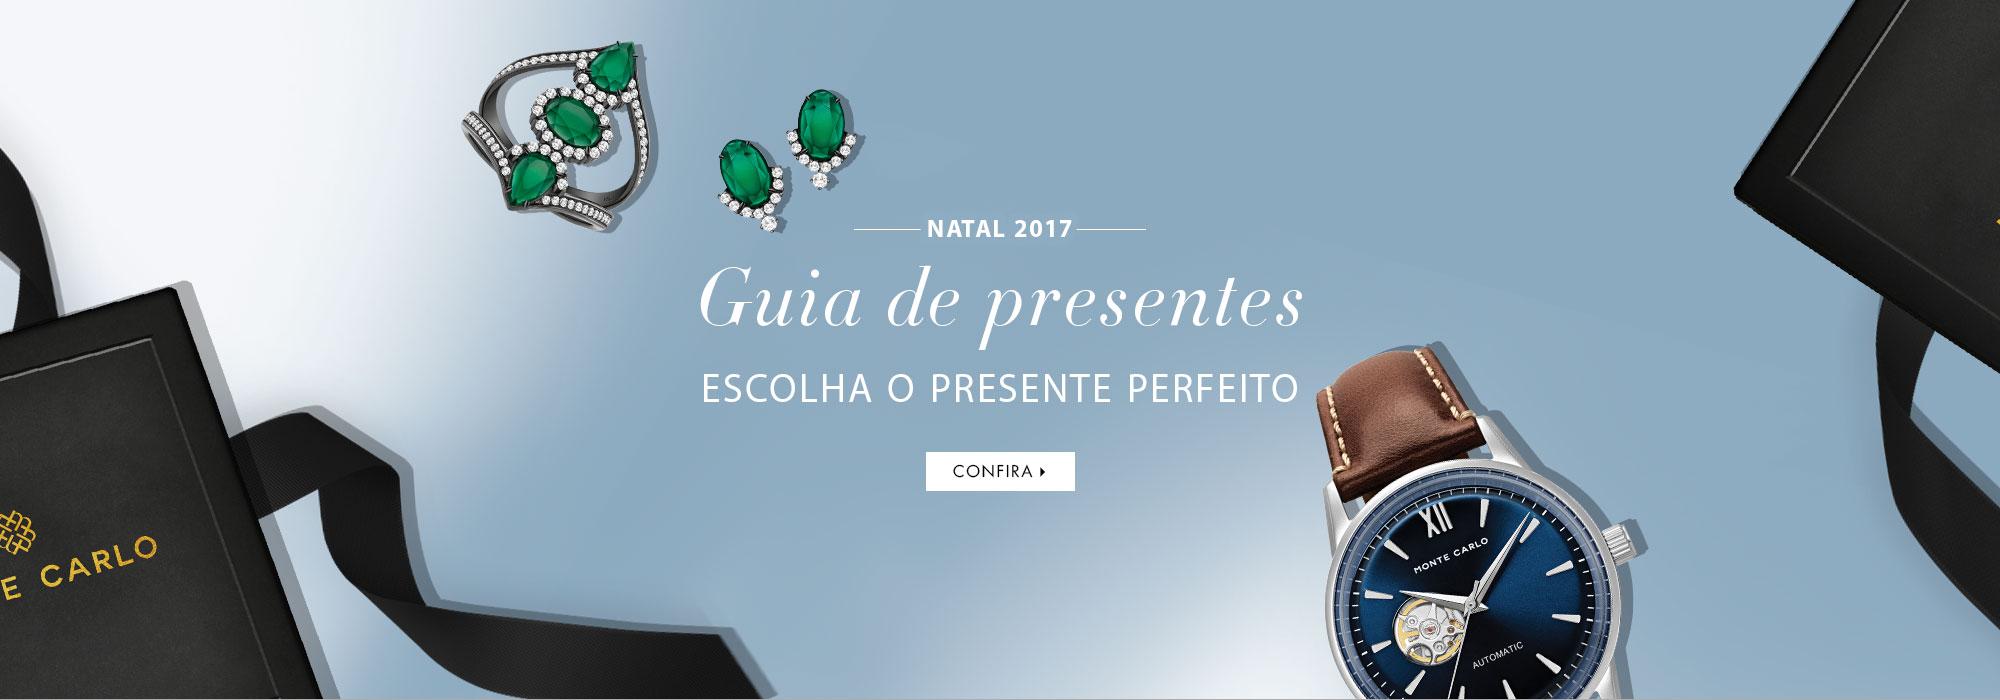 Gift Guide Natal